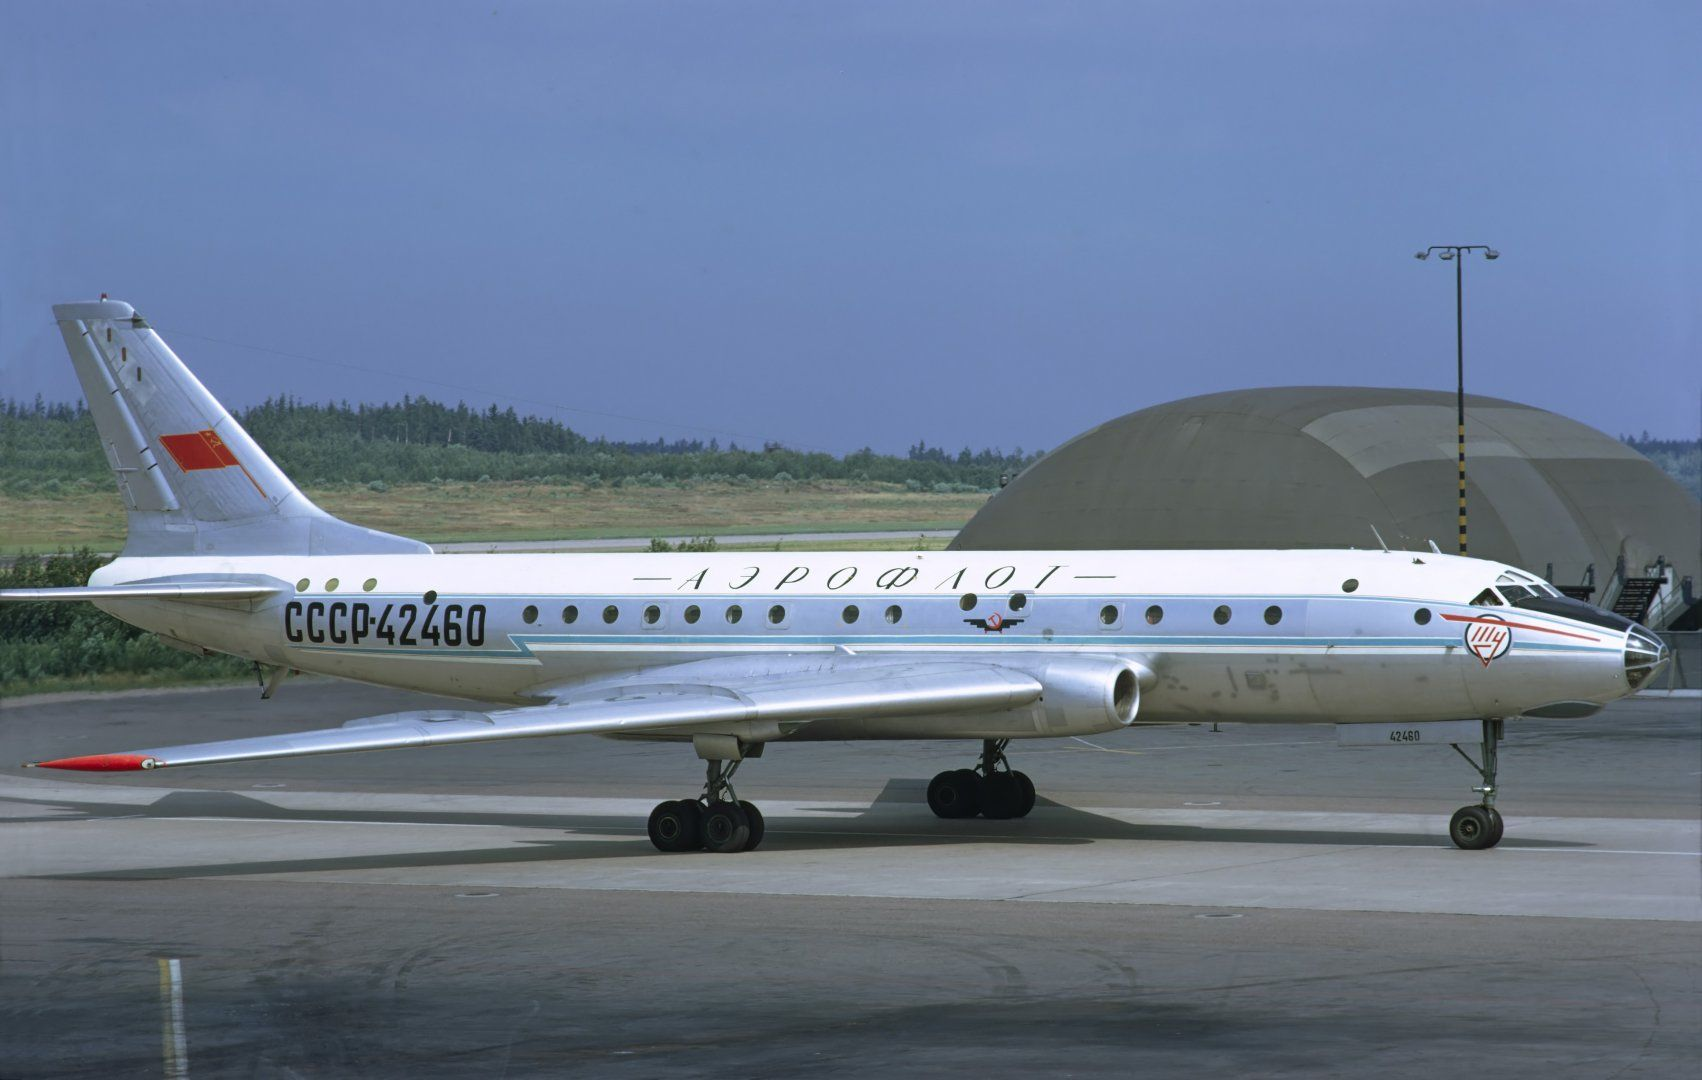 Aeroflot_Tupolev_Tu-104B_at_Arlanda,_July_1972.jpg